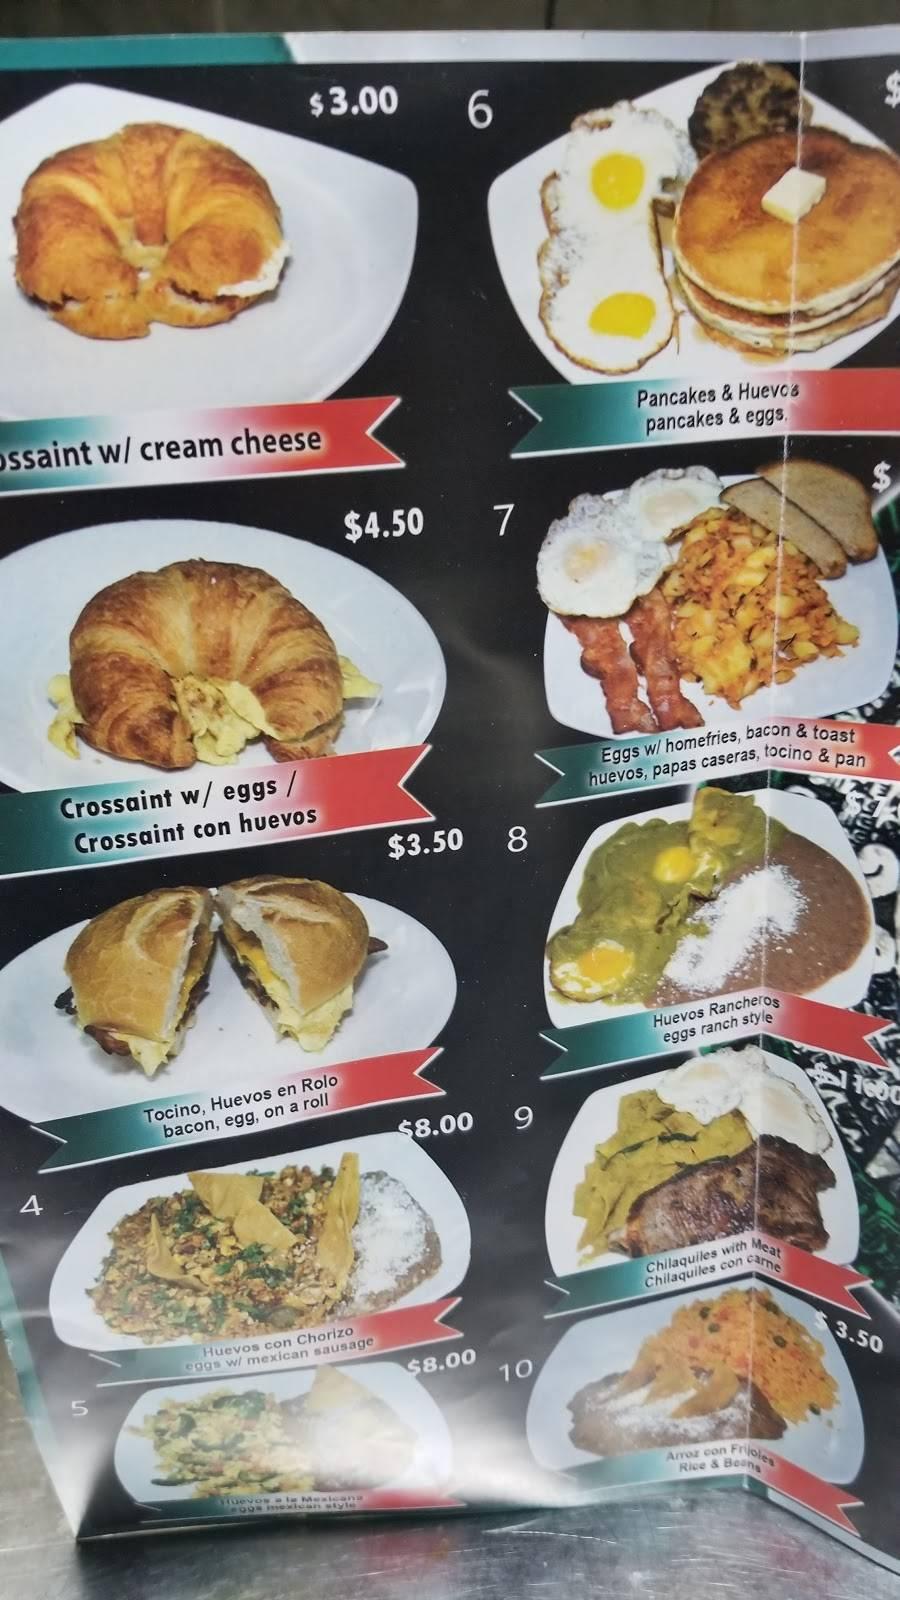 Tacos Carmelita Parientes   restaurant   5701 2nd Ave, Brooklyn, NY 11220, USA   9178611656 OR +1 917-861-1656